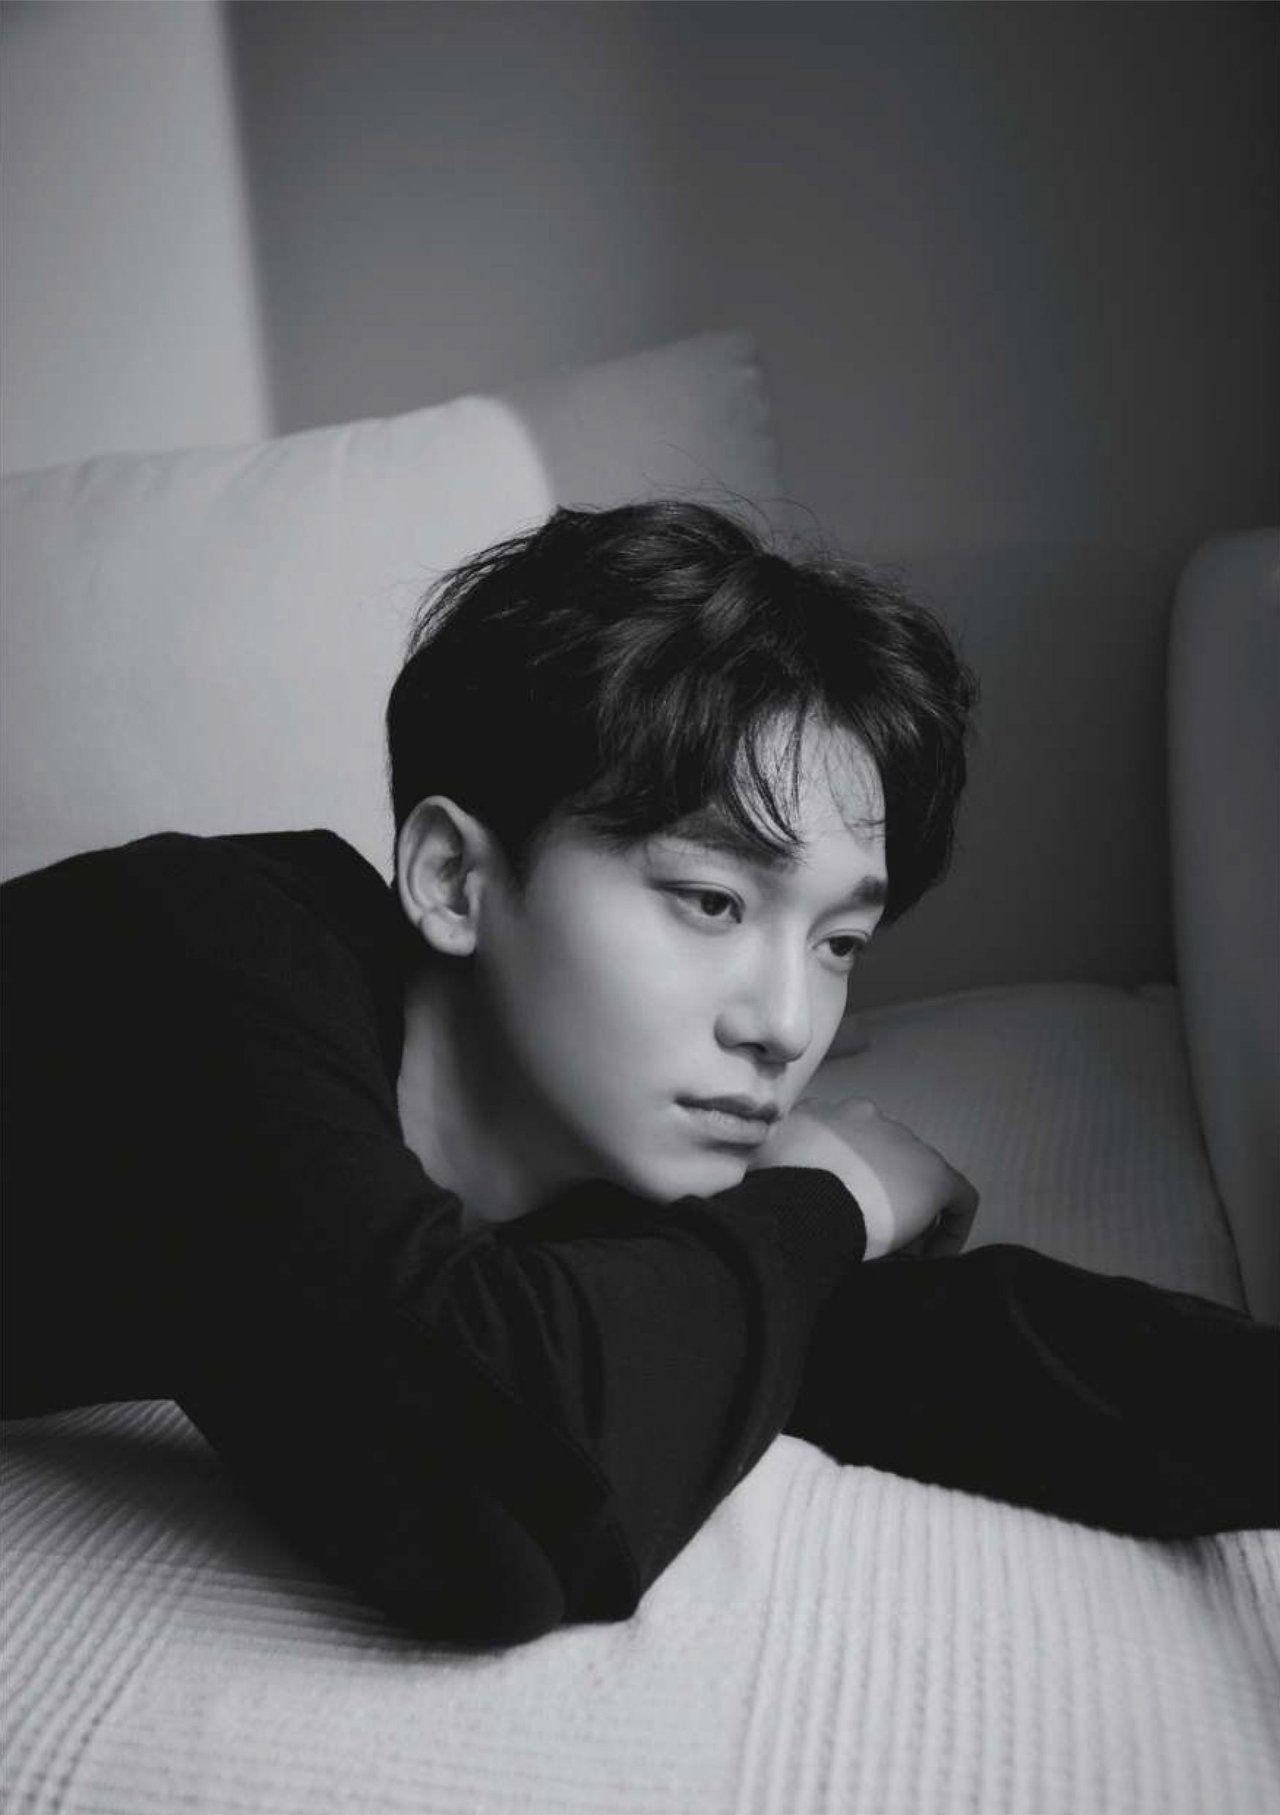 EXO - Chen, Dear My Dear Stream Shall we? on Youtube and ...